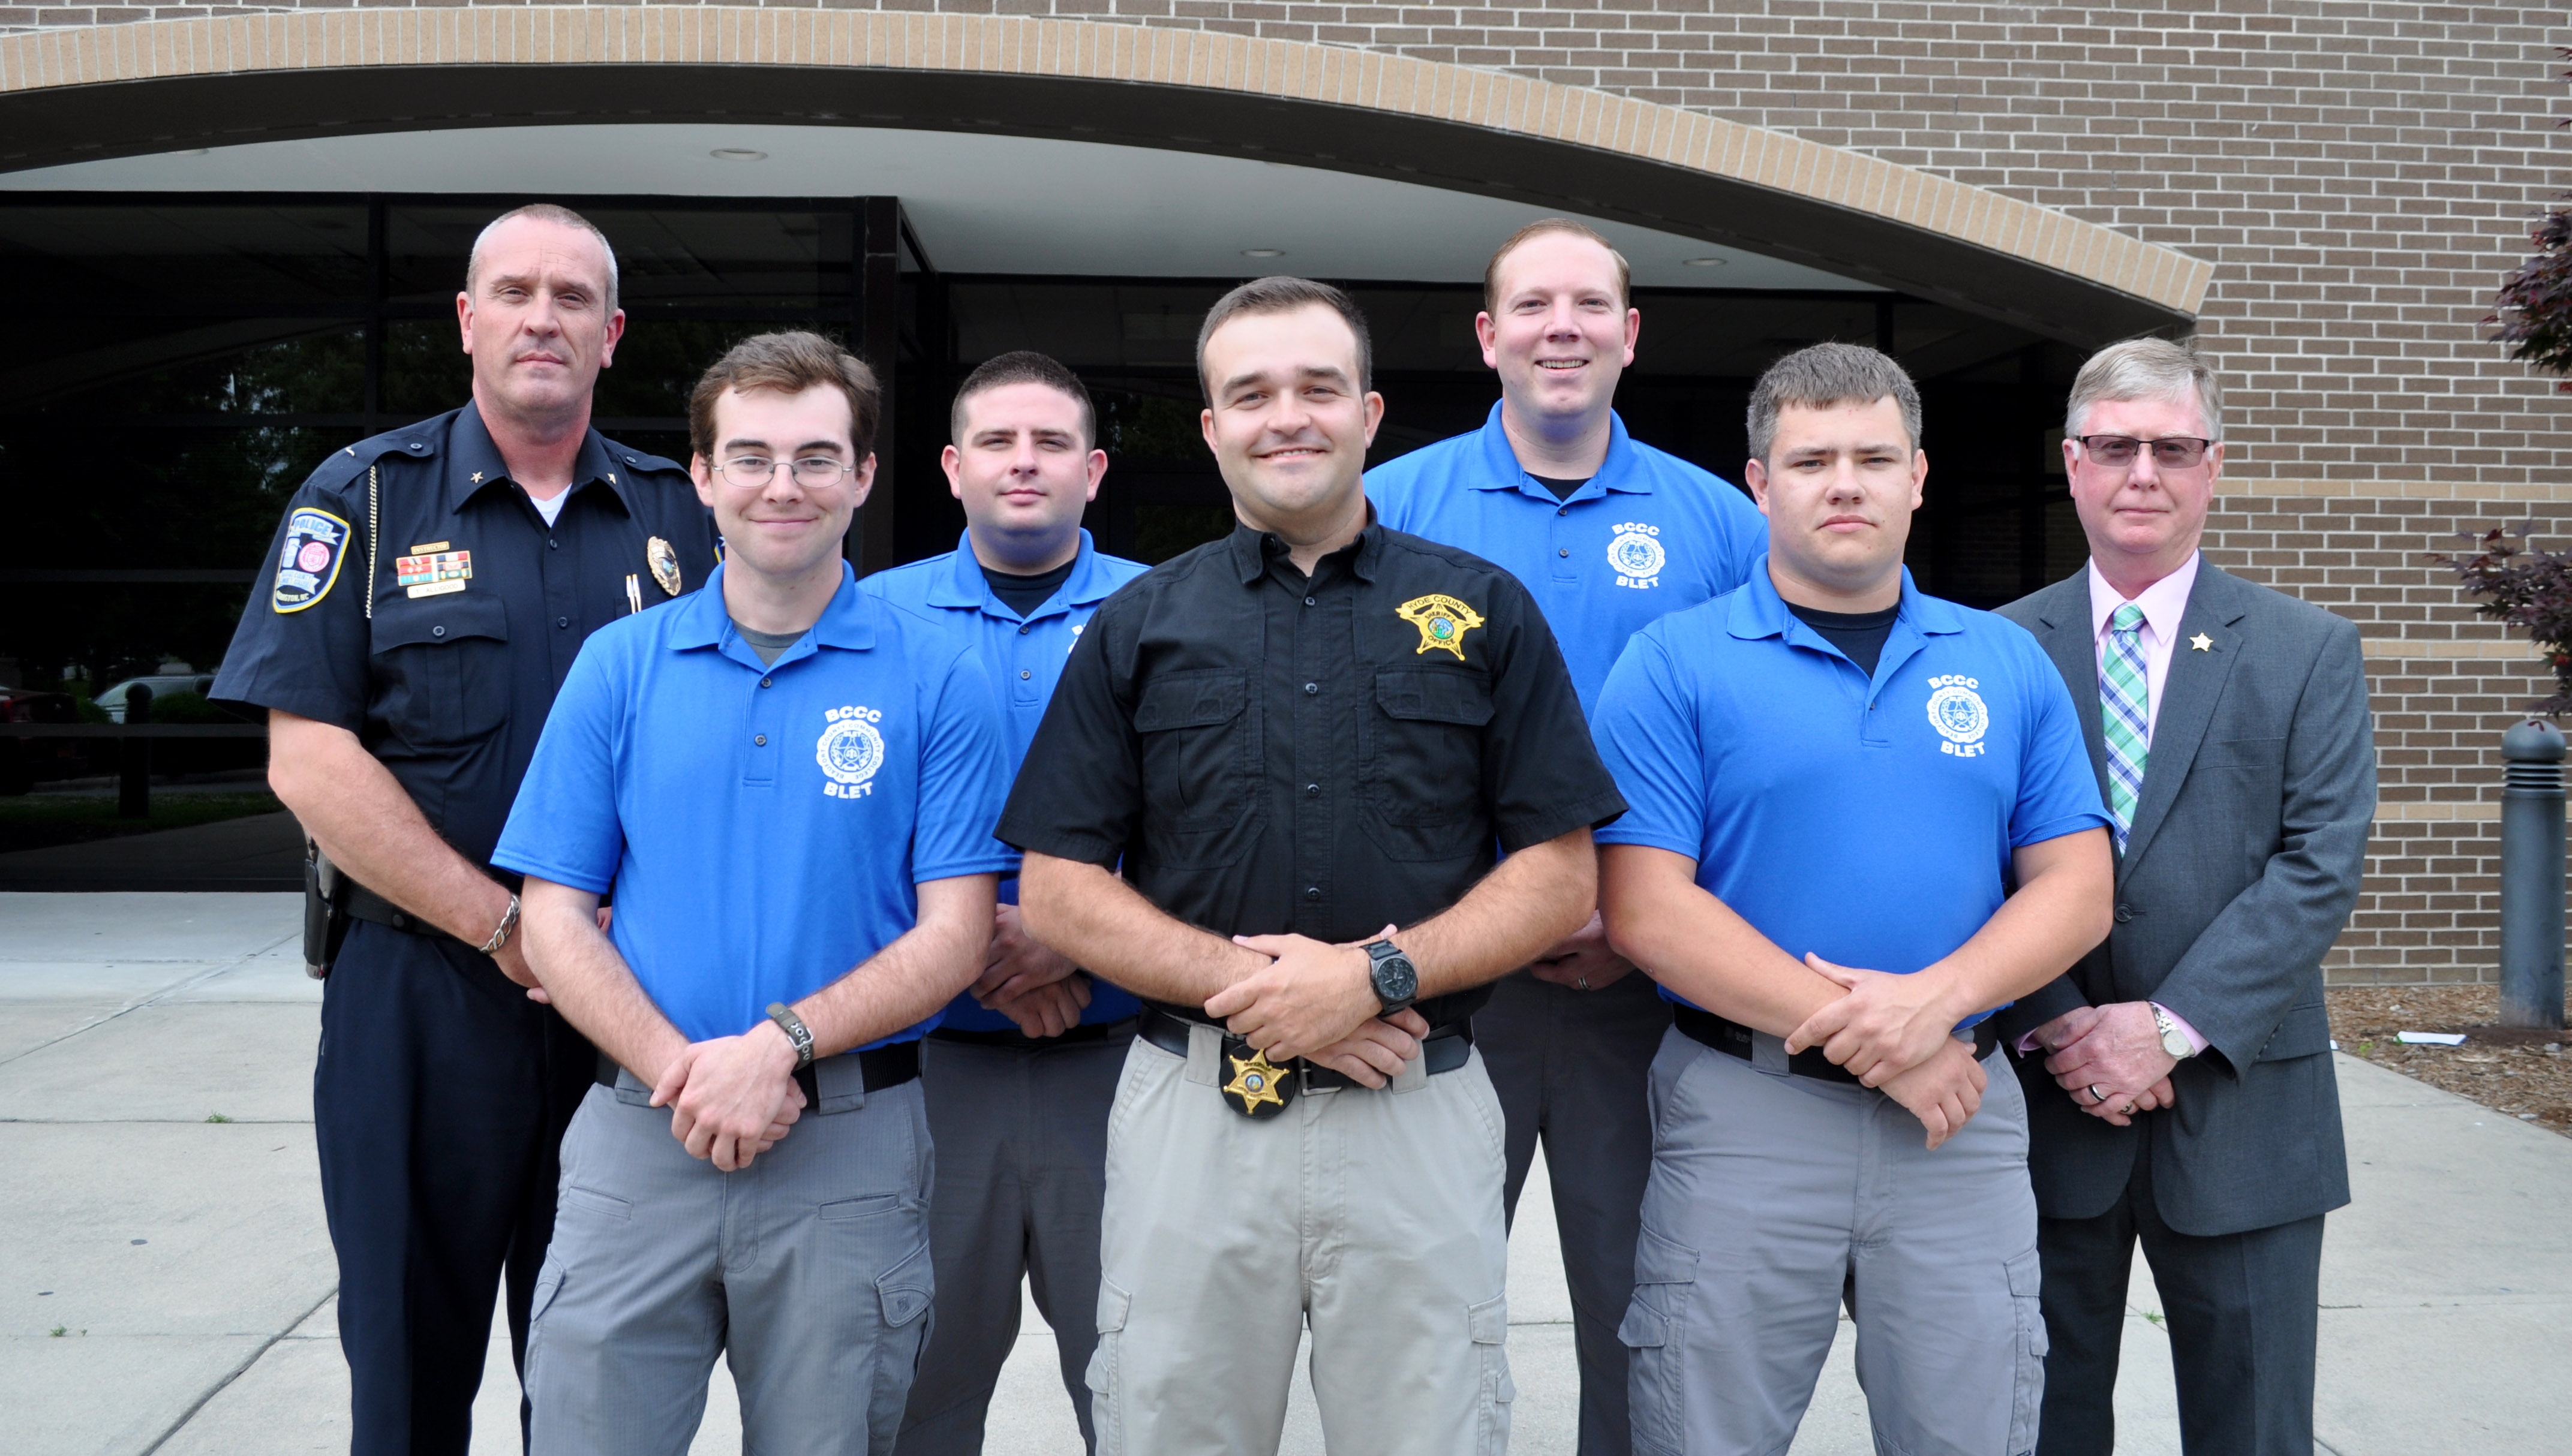 Ceremony Honors Spring 2018 Law Enforcement Graduates Beaufort